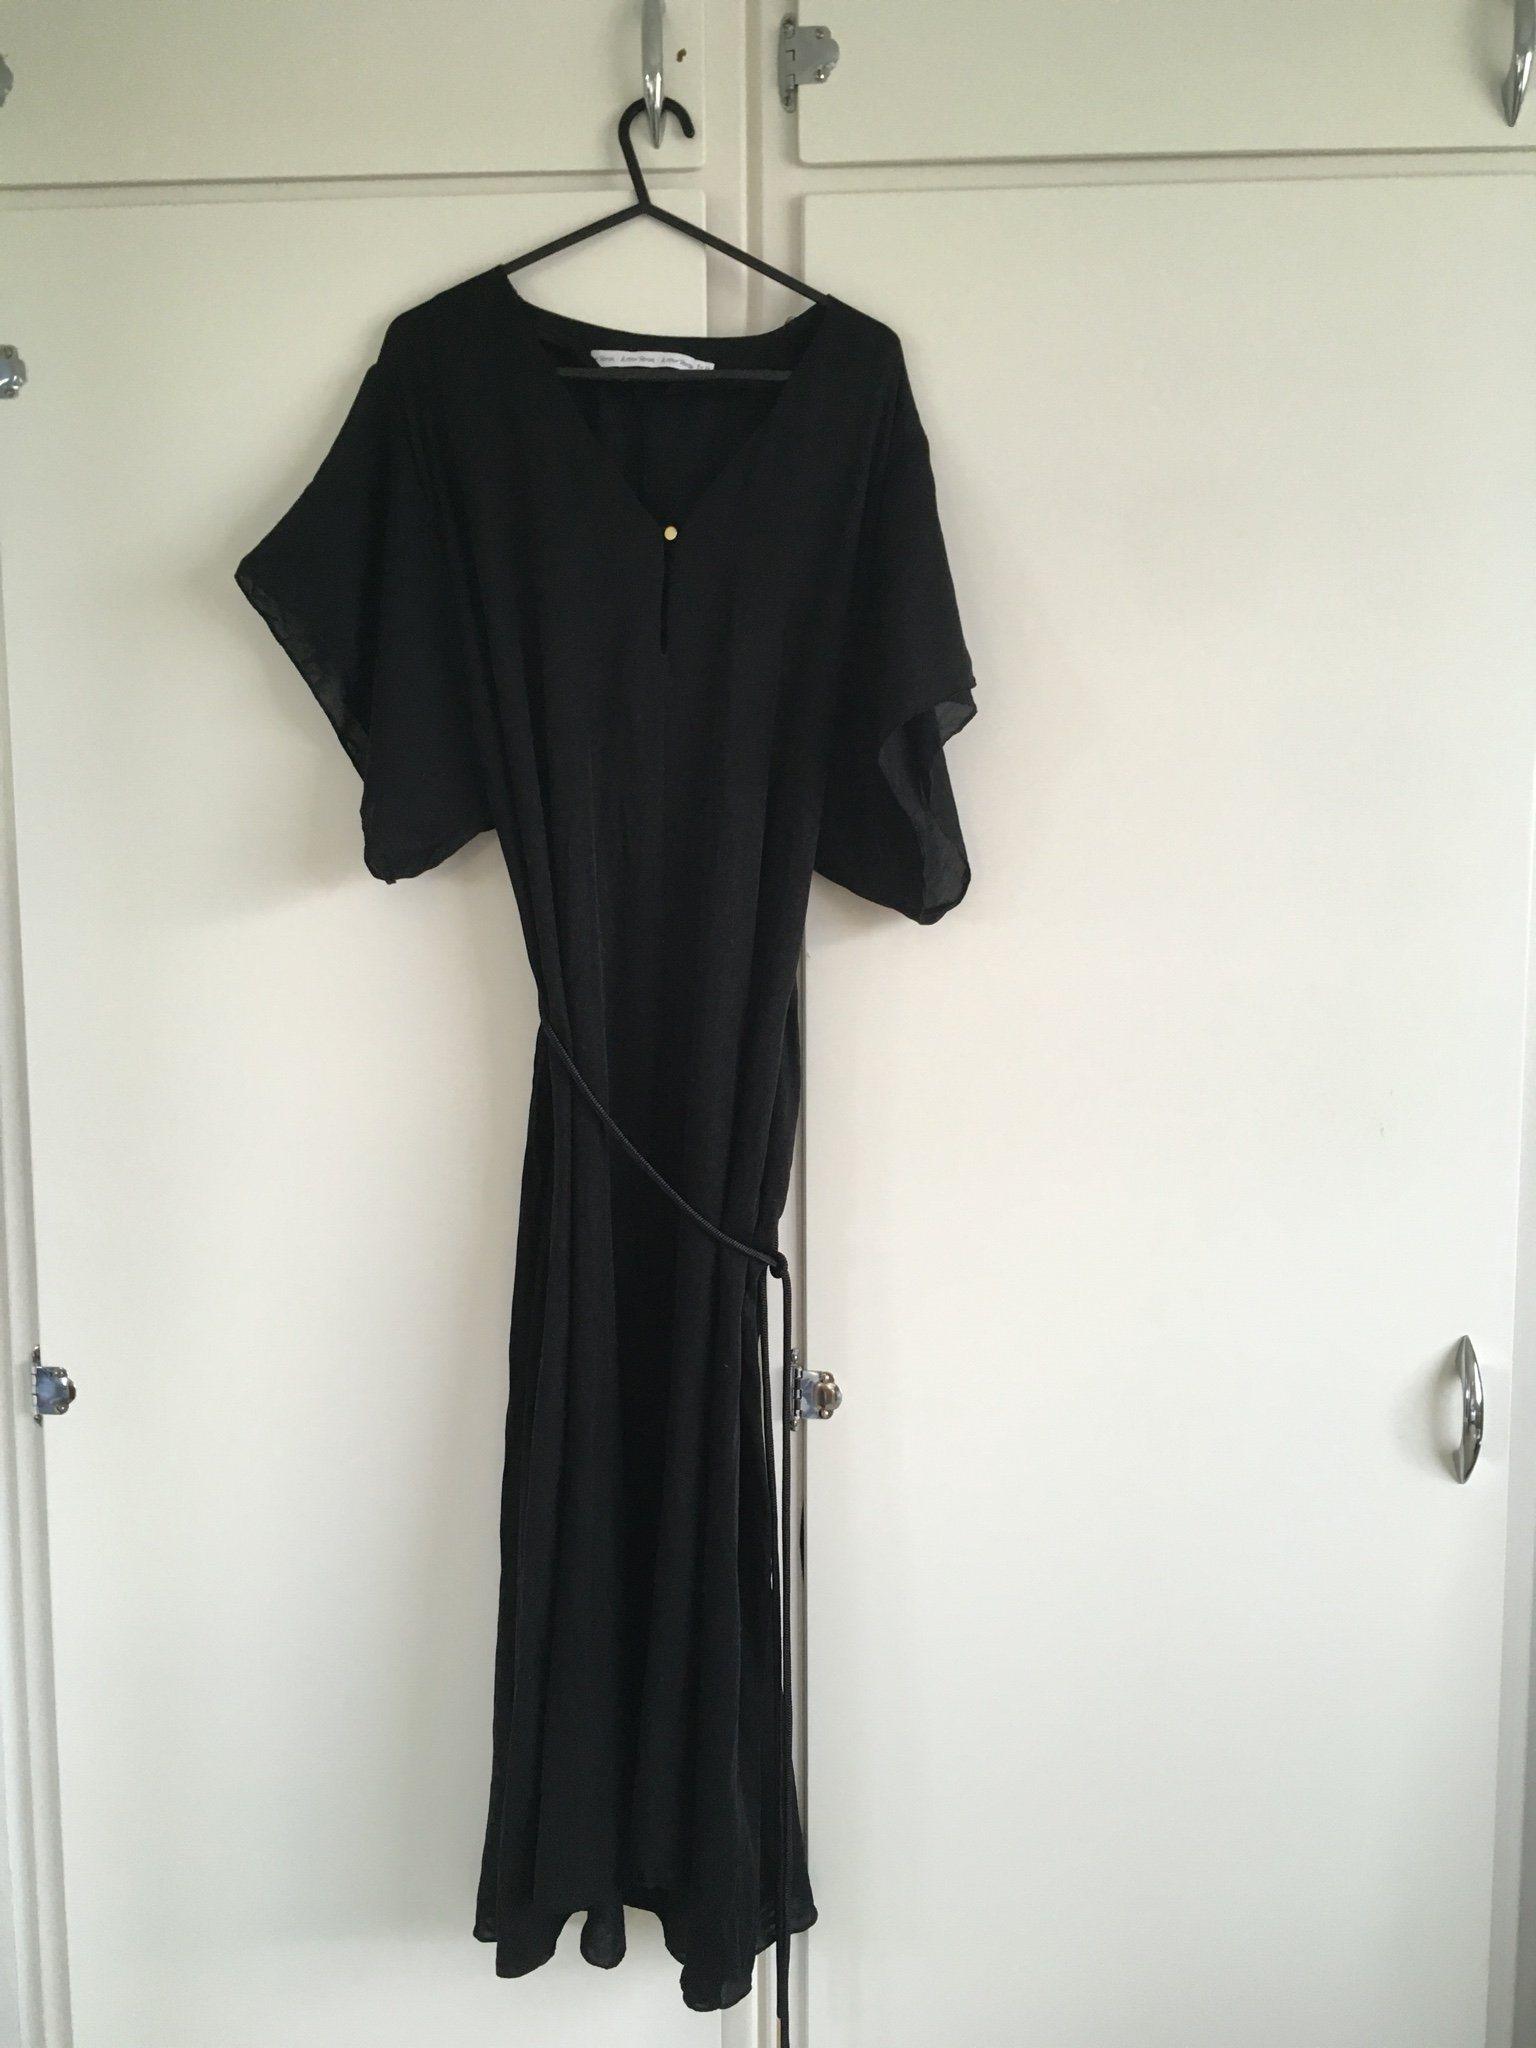 32abf6ffd2de other stories kaftan klänning strand trend svart oversize skärp sommar  luftig